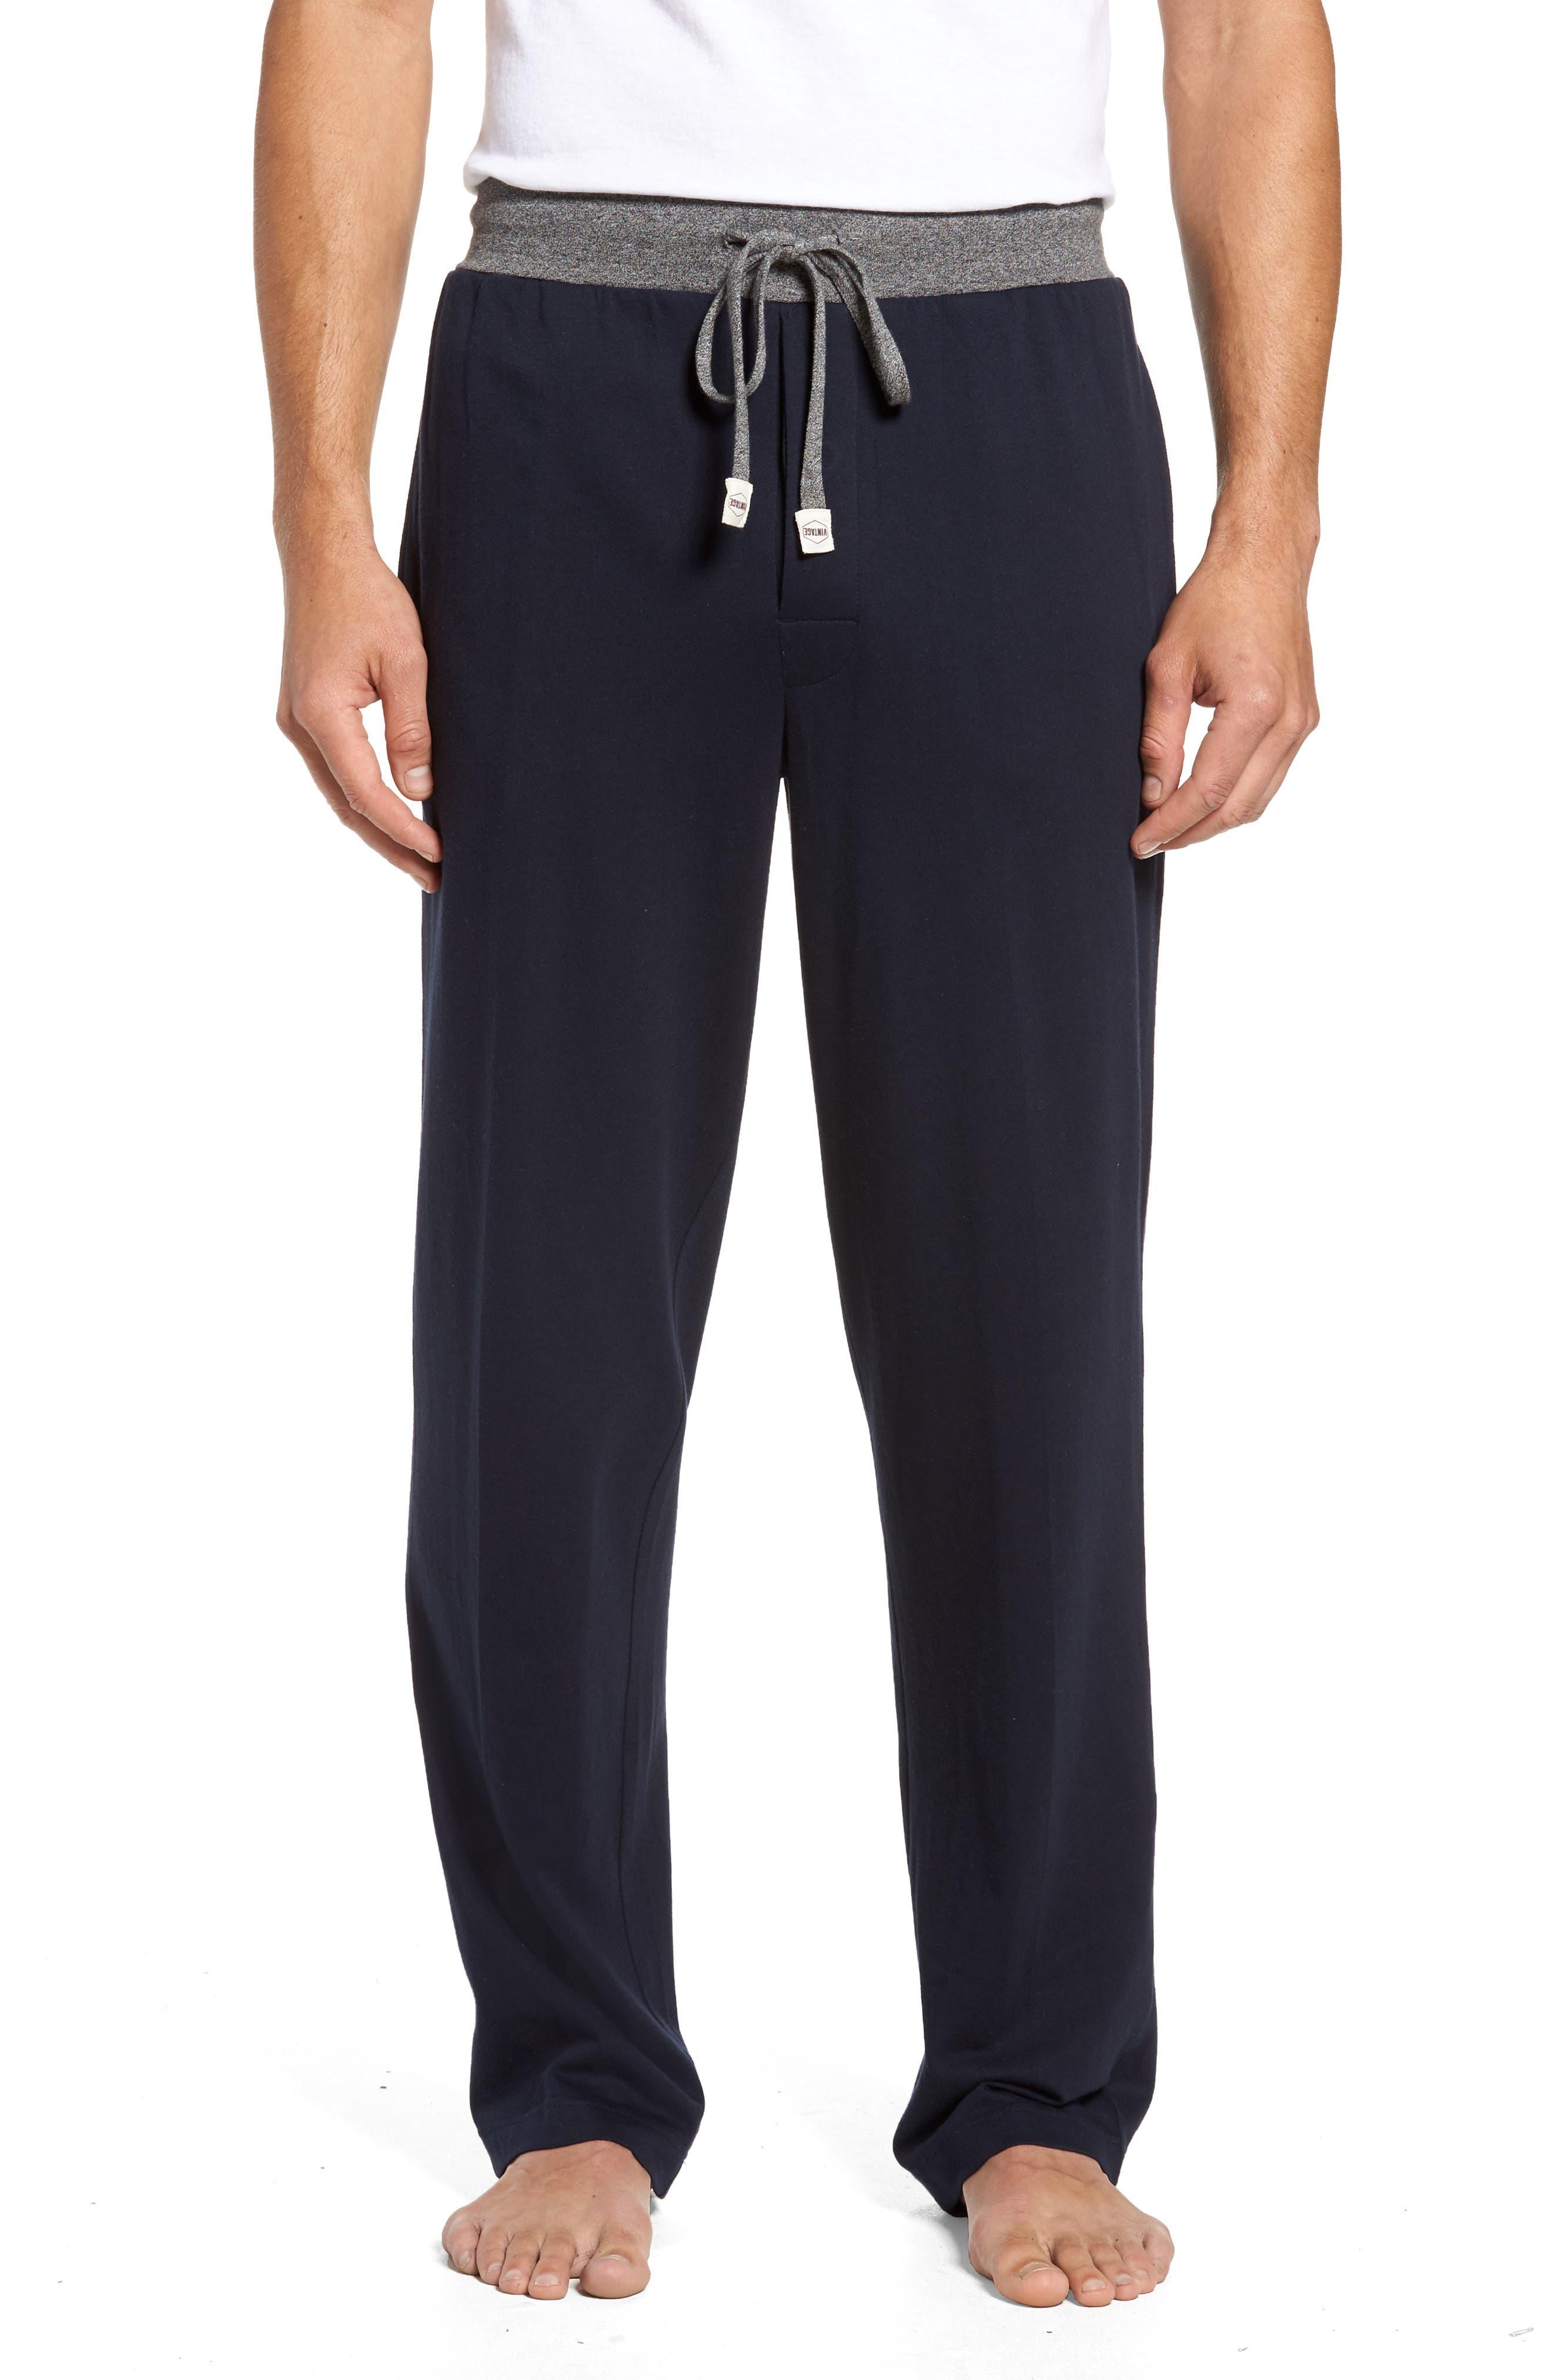 Trey Knit Lounge Pants,                         Main,                         color, Navy